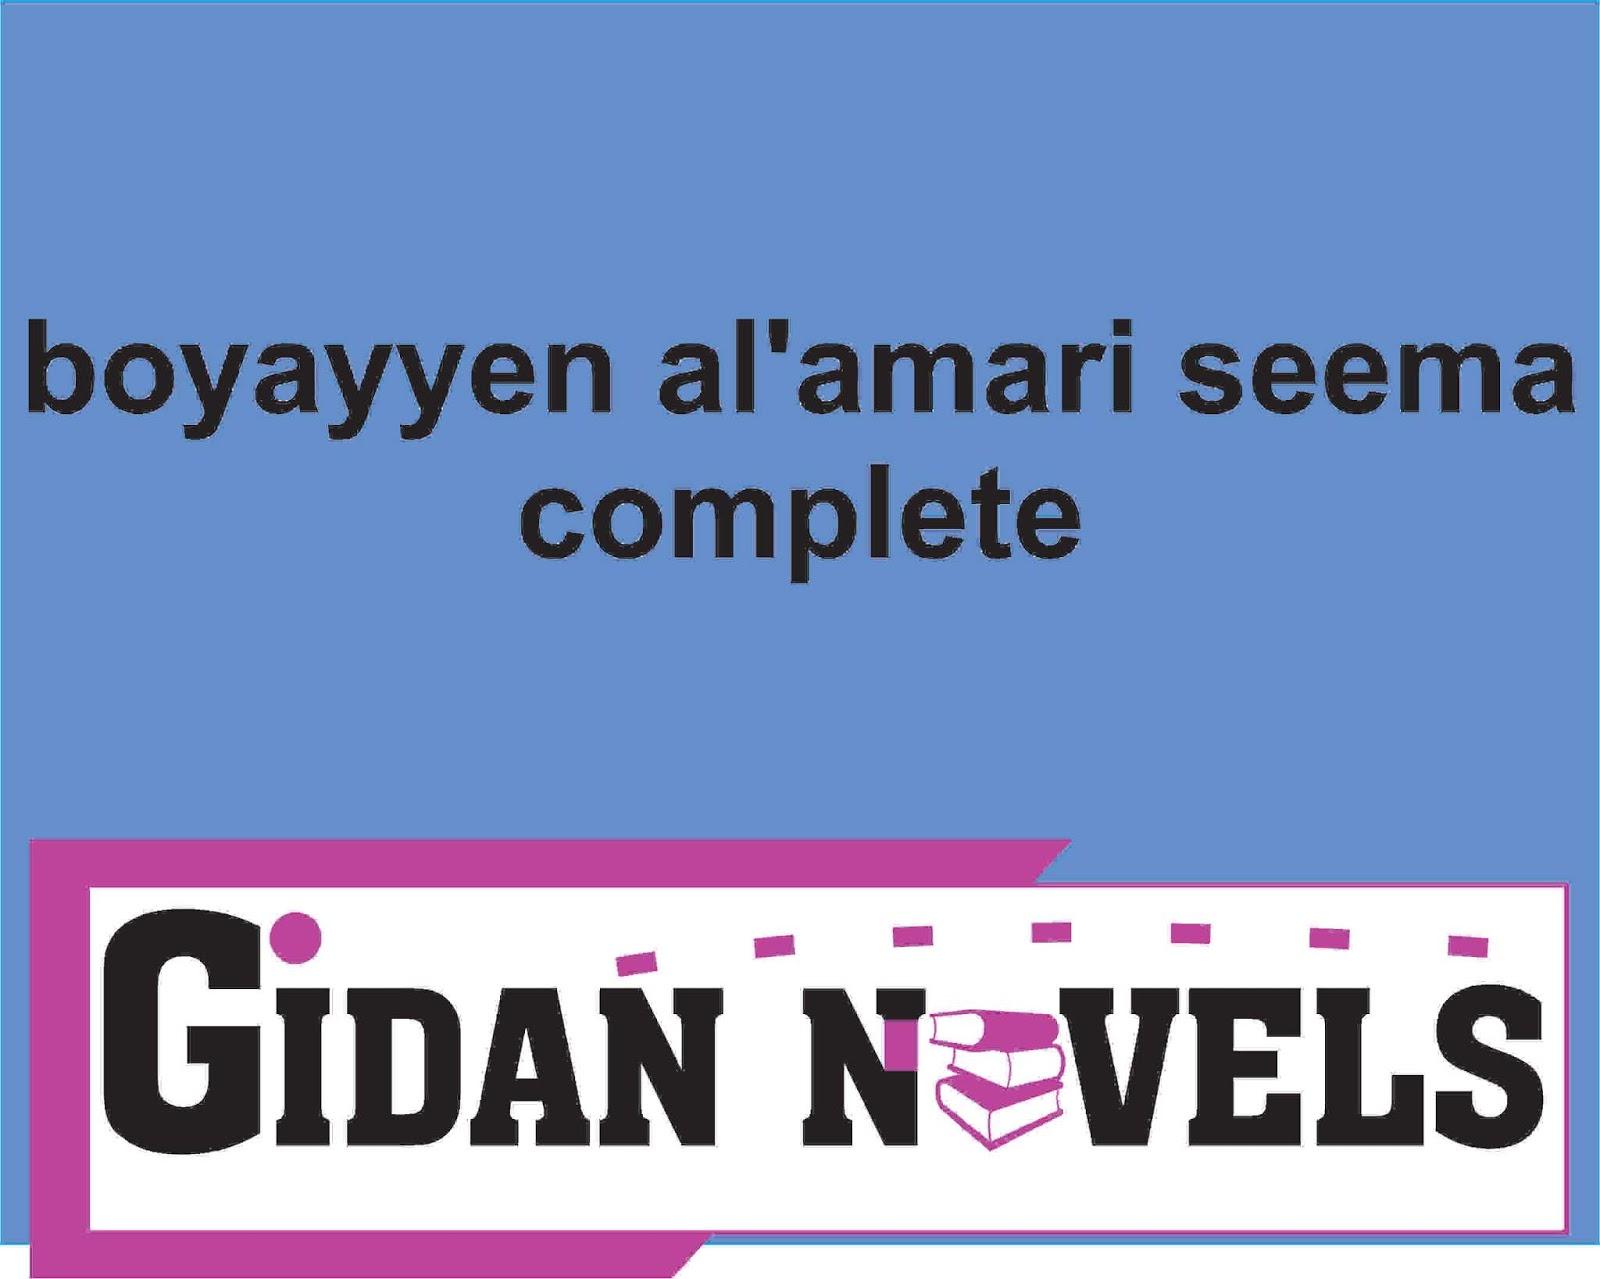 boyayyen-alamari-seema-complete-hausa-novel - Gidan Novels